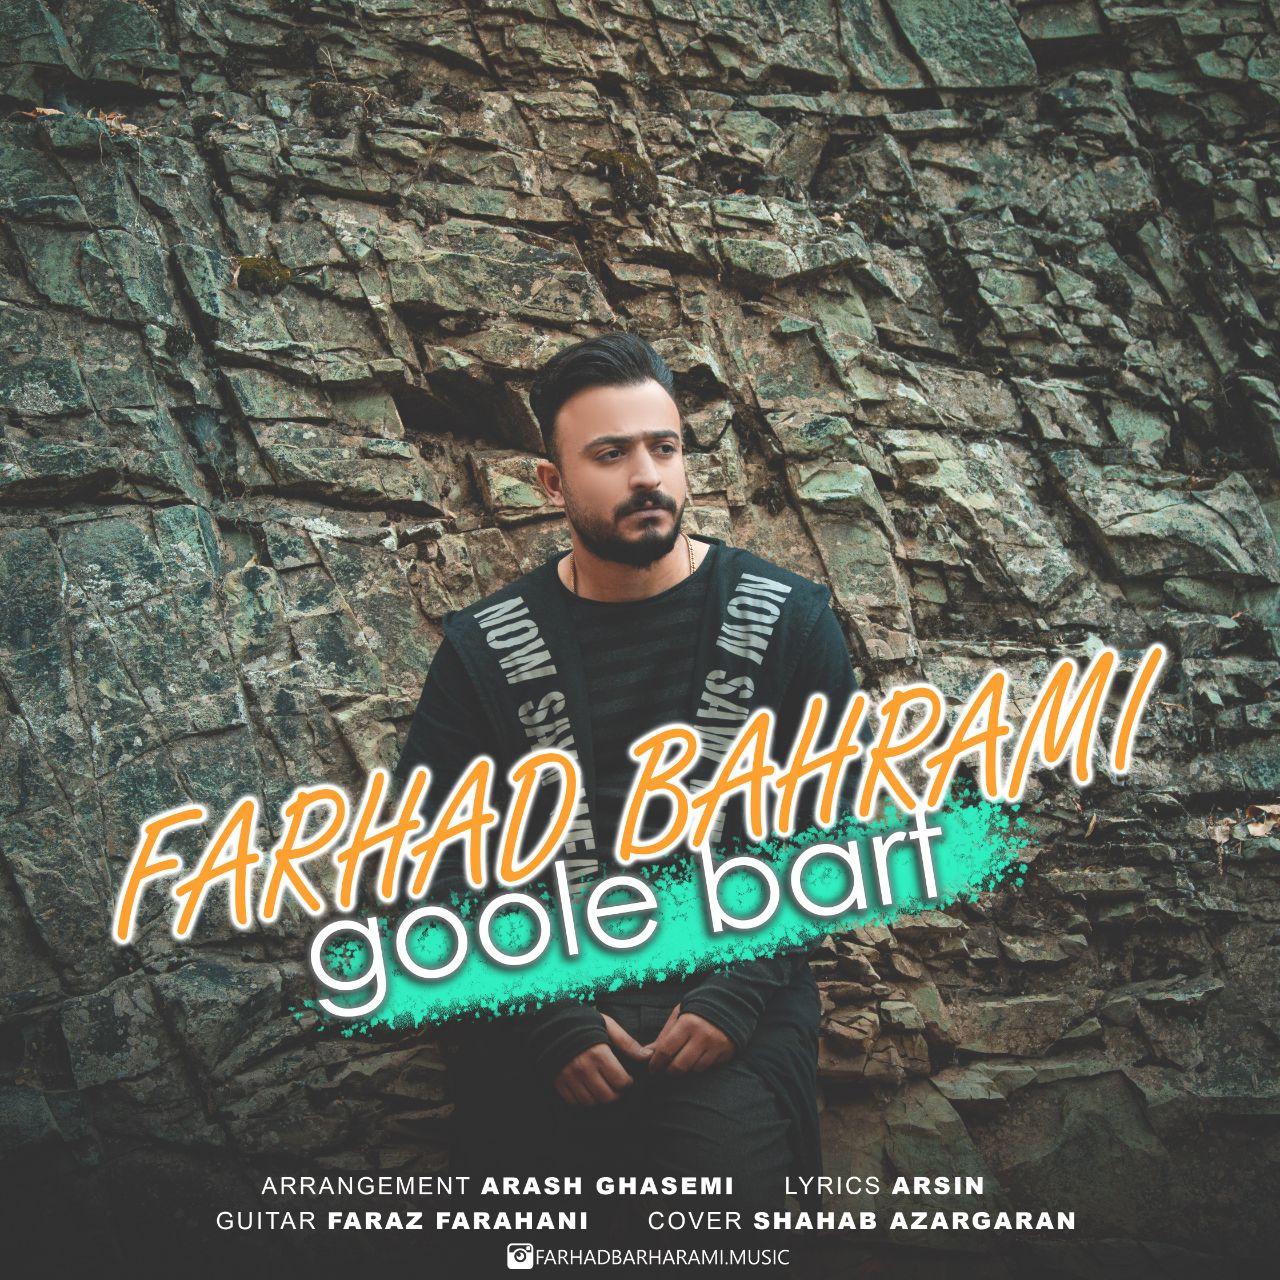 Farhad bahrami – Goole Barf